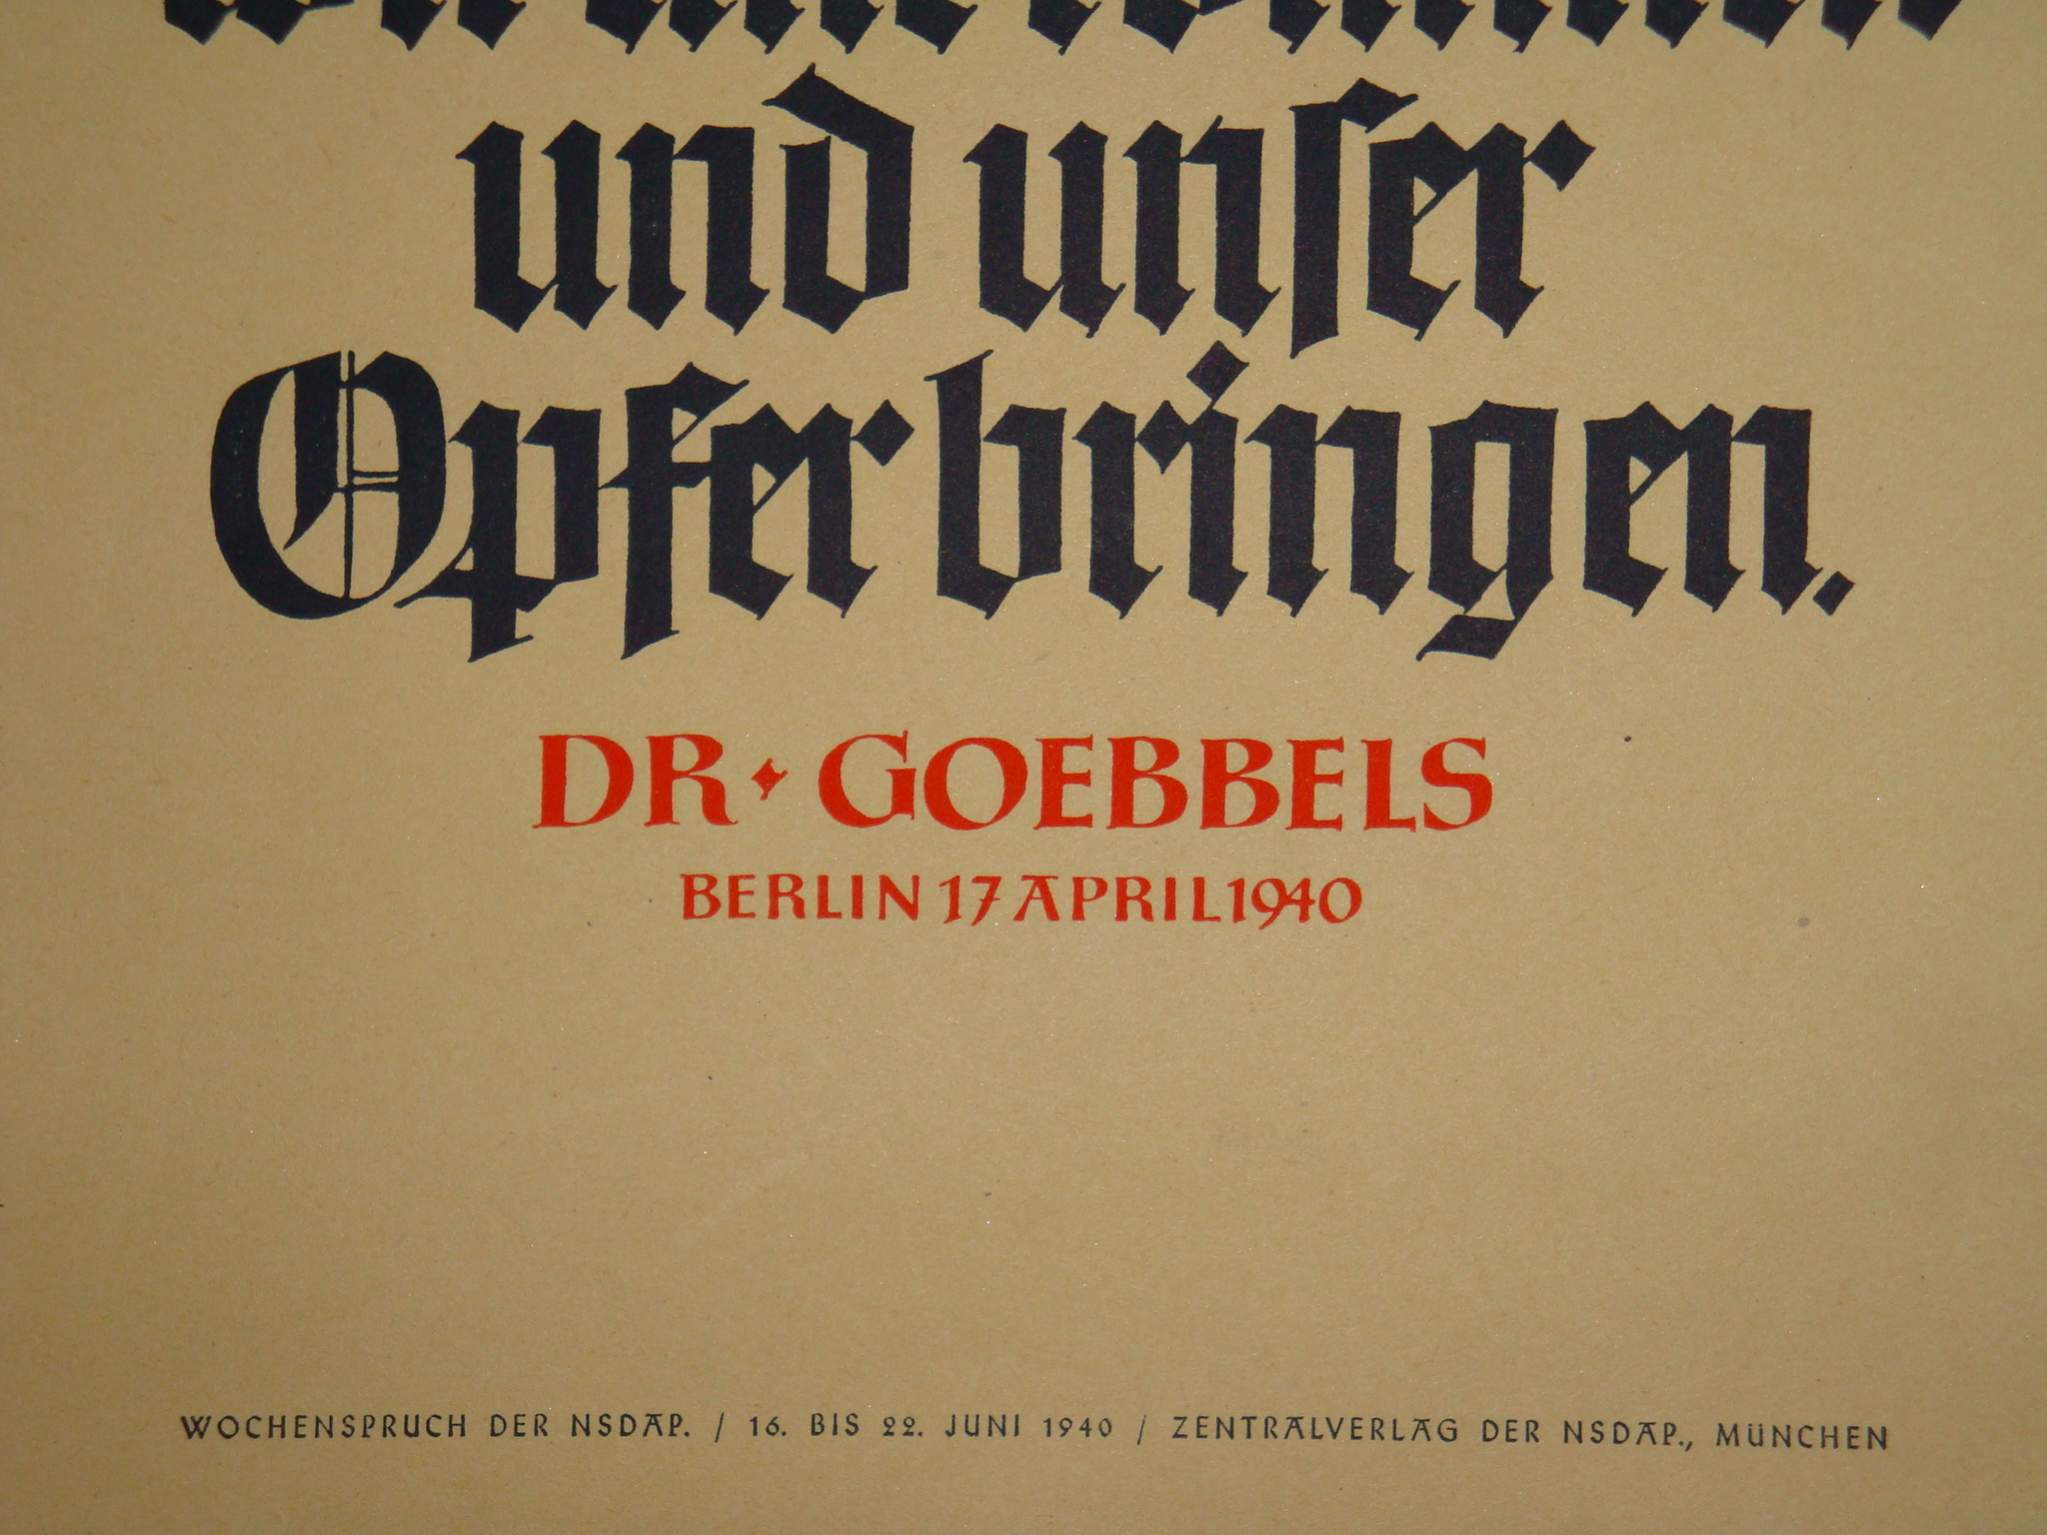 Joseph Goebbels Propaganda Posters Drk propaganda poster: